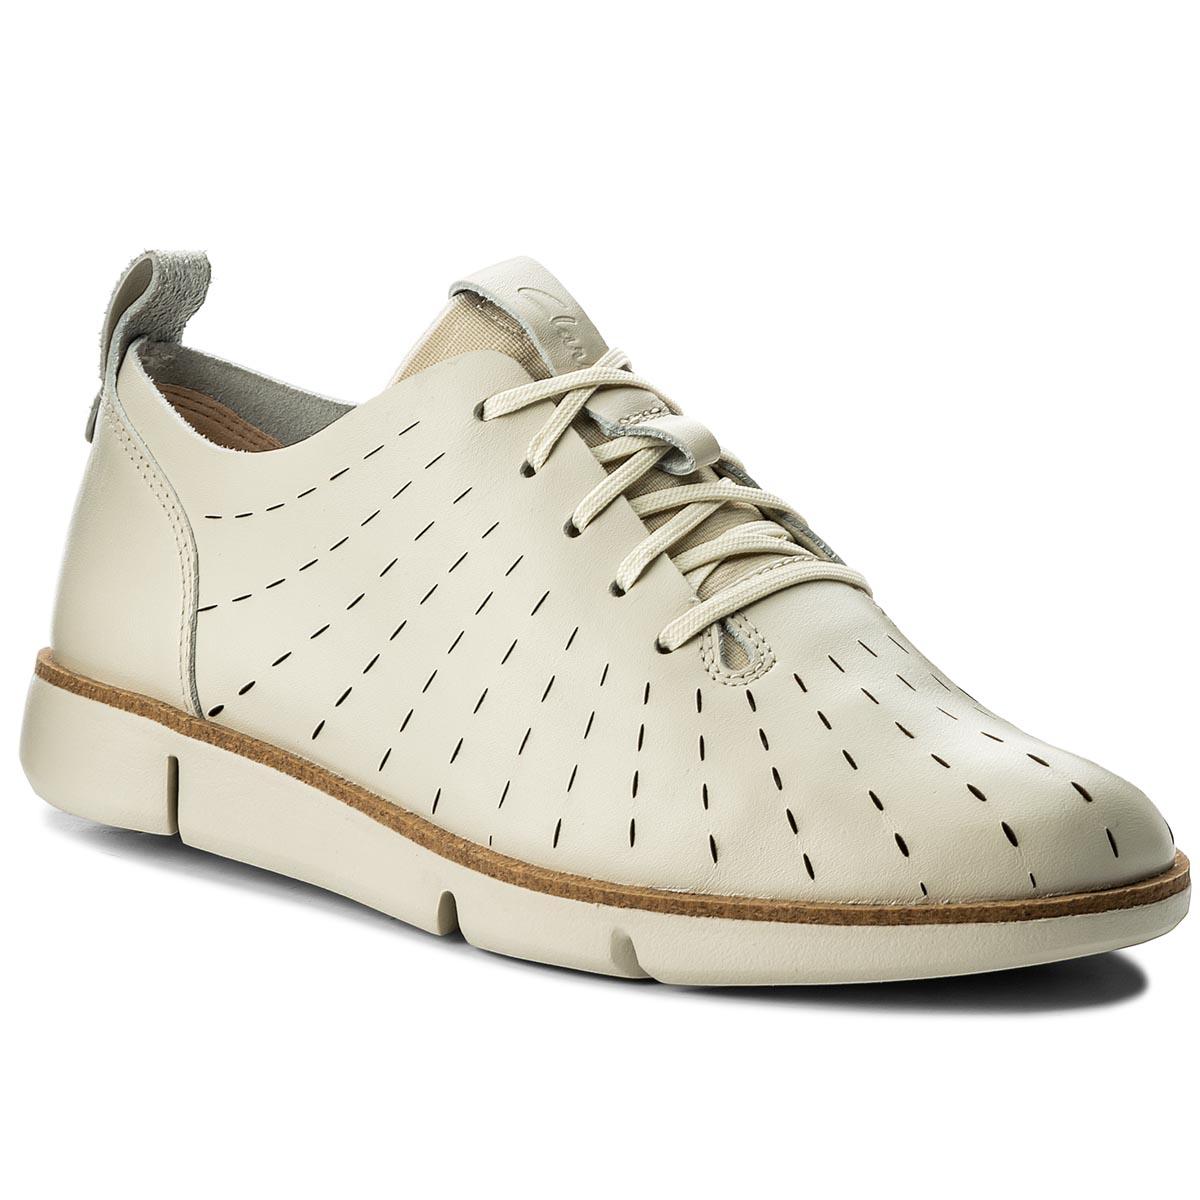 Gem Flat 203197 Gs Navybijou Crocs Sandals Ii Blue Genna XkiuPZ